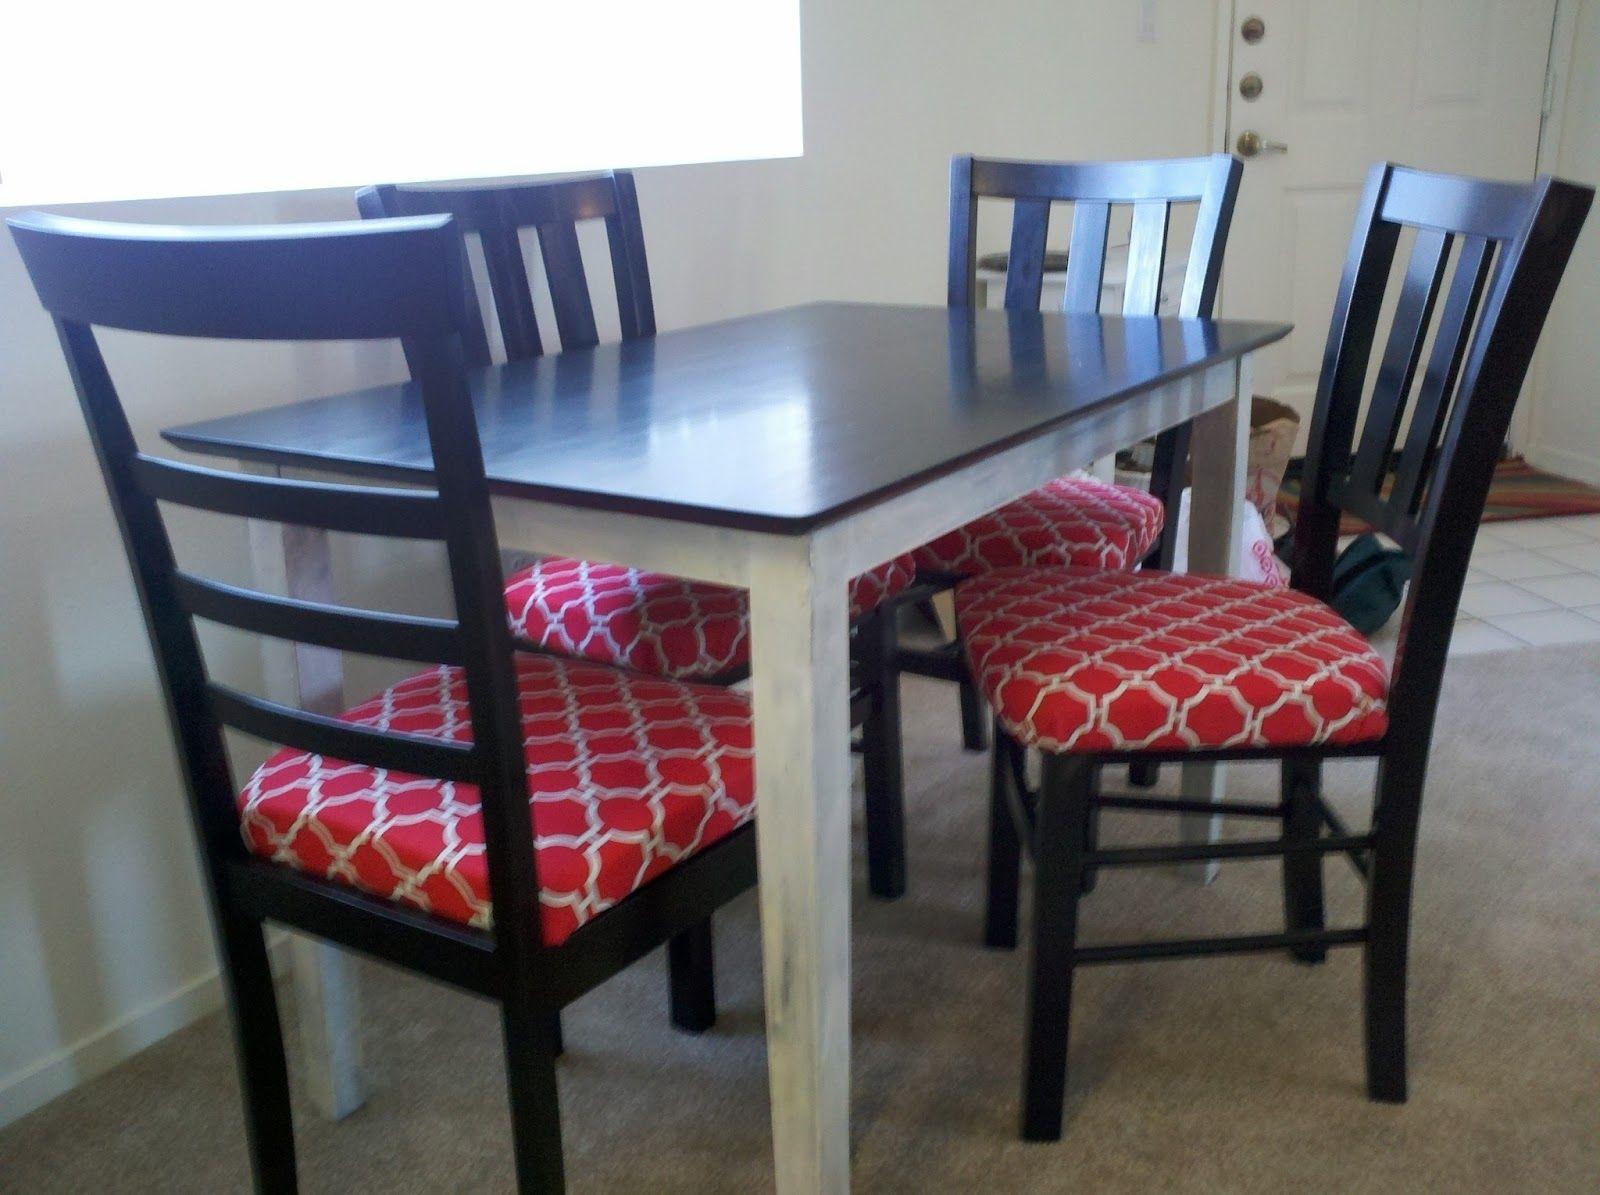 Custom Dining Room Chair Cushions Enricbataller Net. Custom Dining Room Chair Cushions   Indiepretty